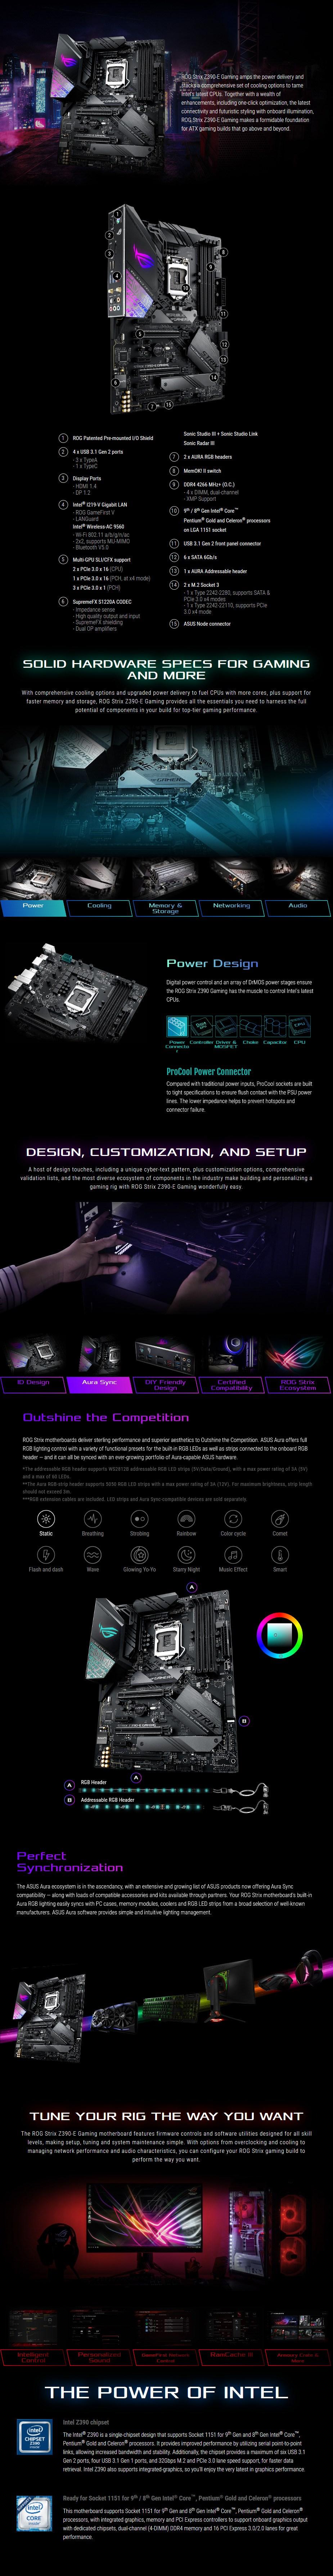 ASUS ROG Strix Z390-E GAMING LGA 1151 ATX Motherboard